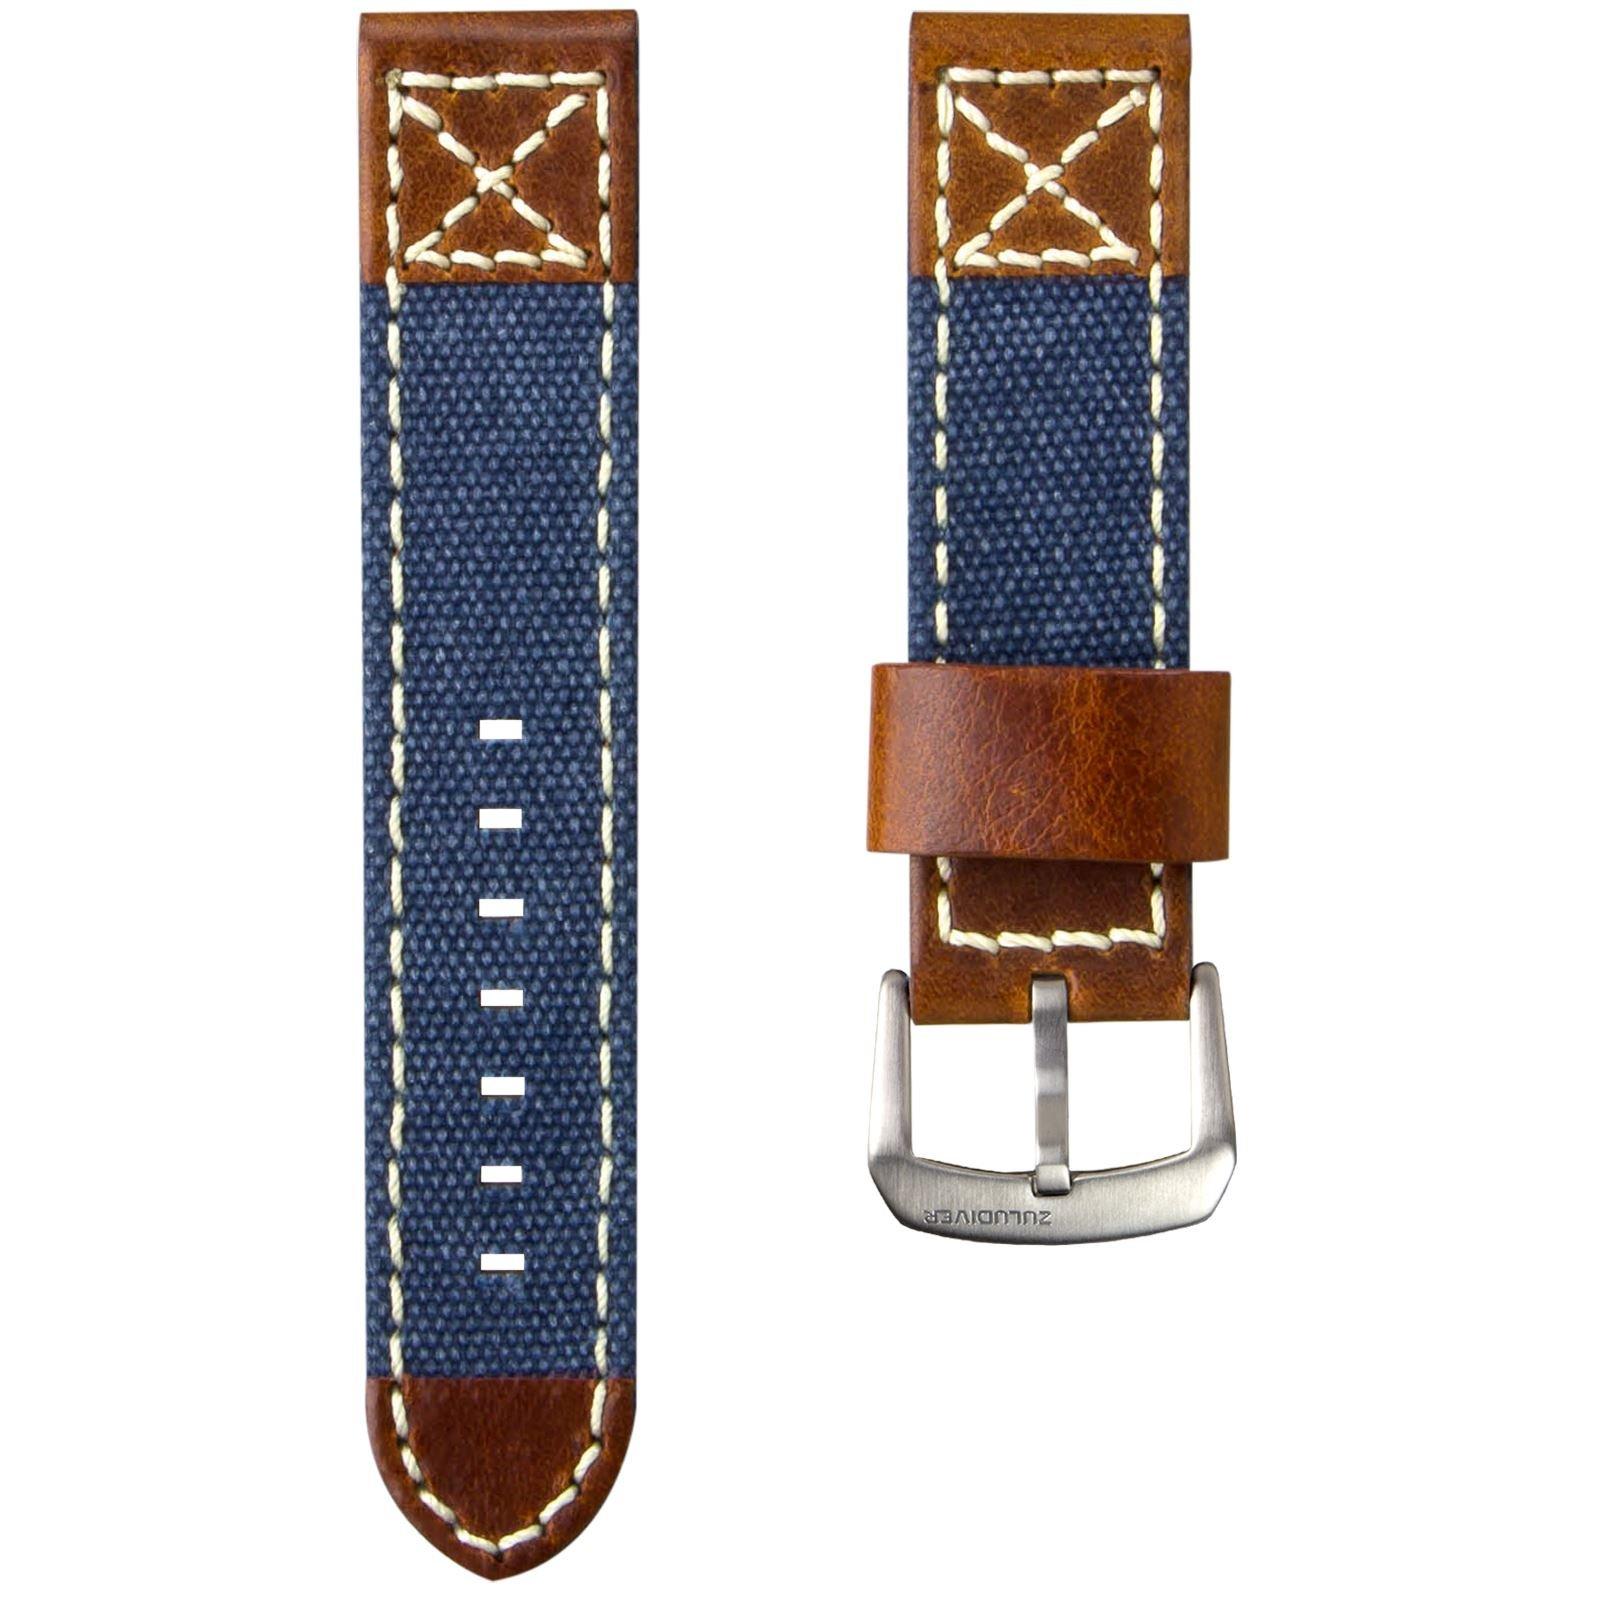 ZULUDIVER Canvas & Italian Leather Watch Strap, Navy Blue & Vintage Brown, 22mm